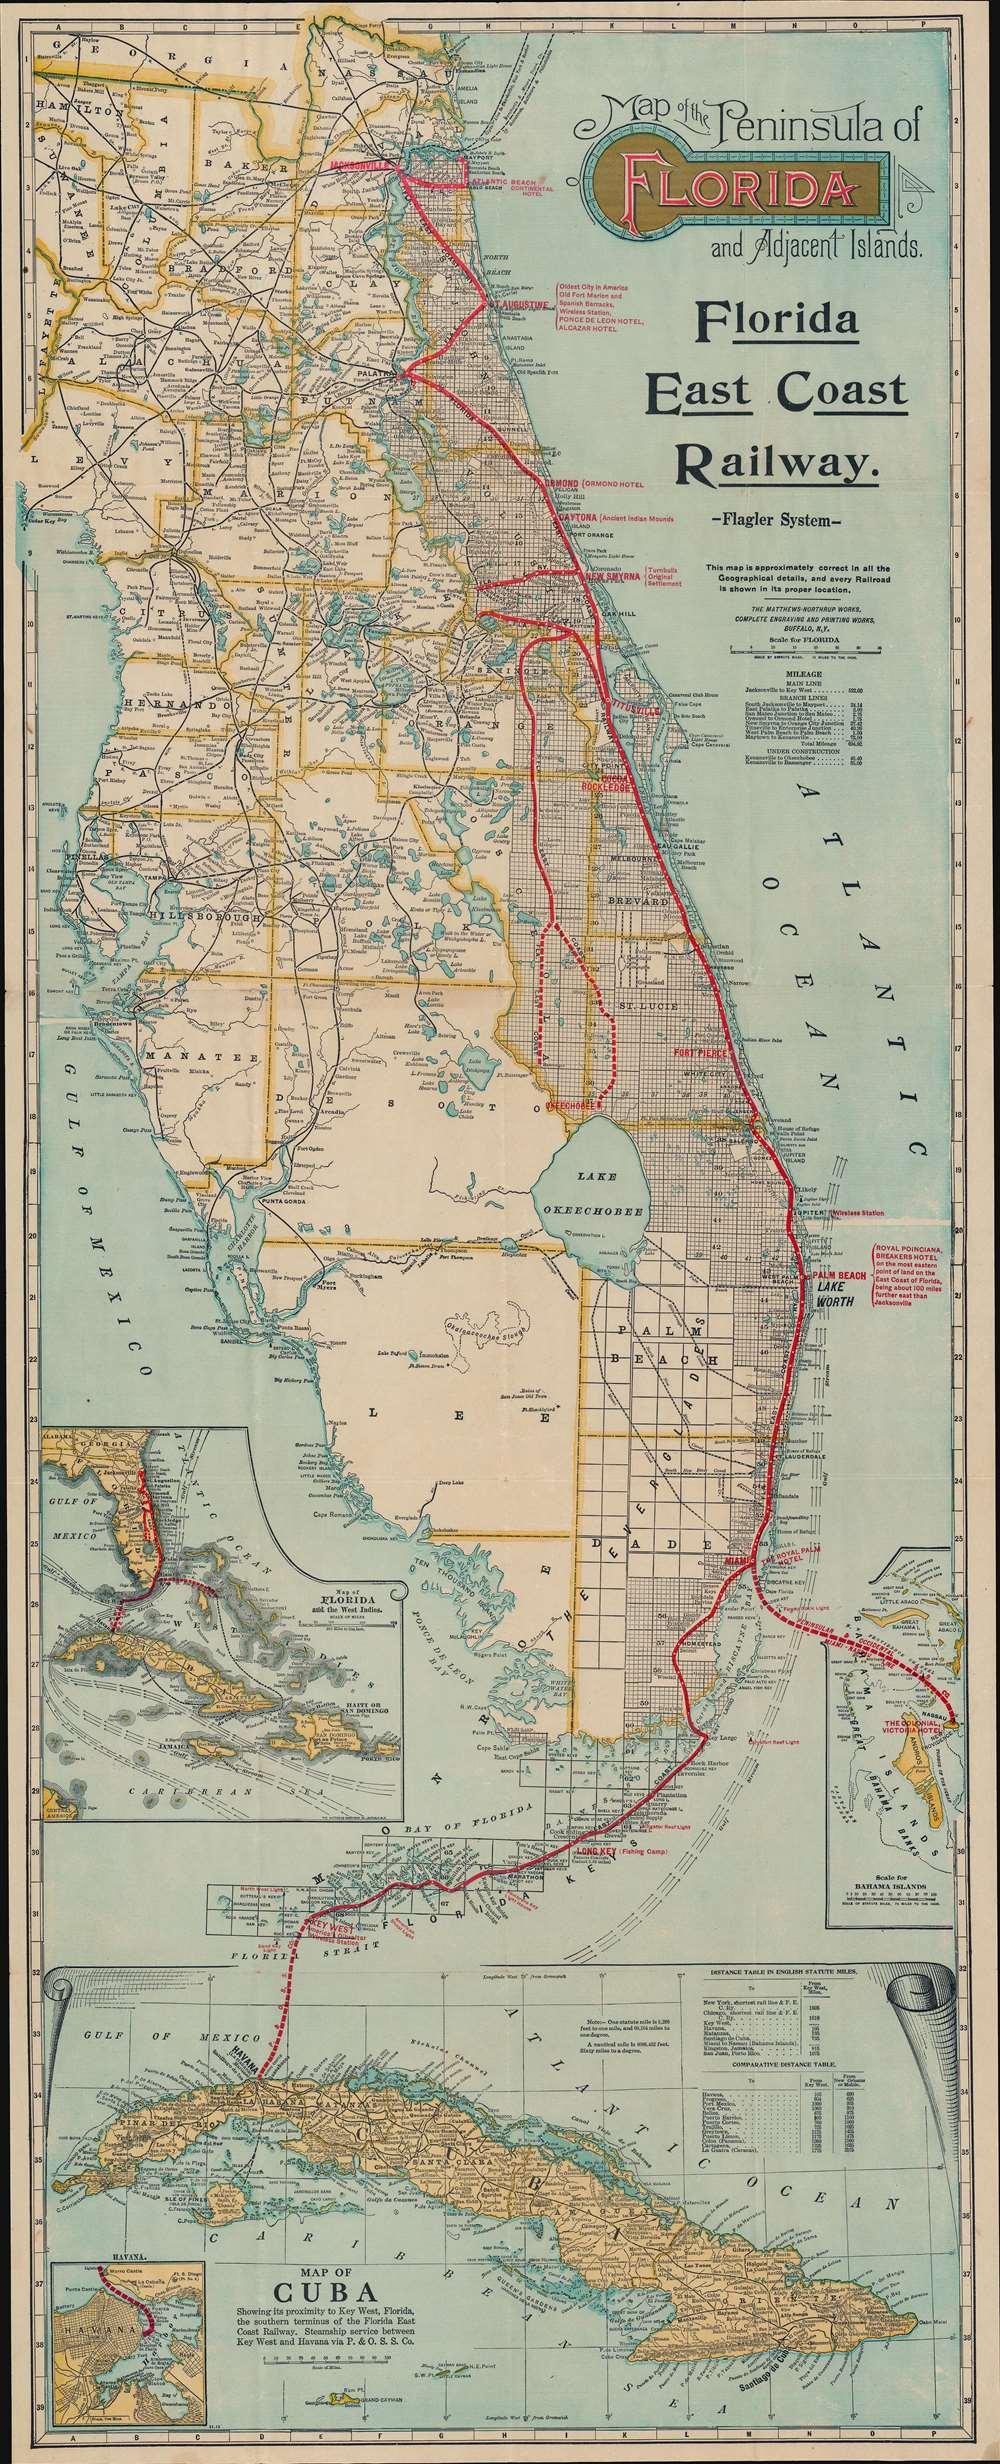 1914 Florida East Coast Railway Railroad Map of Florida